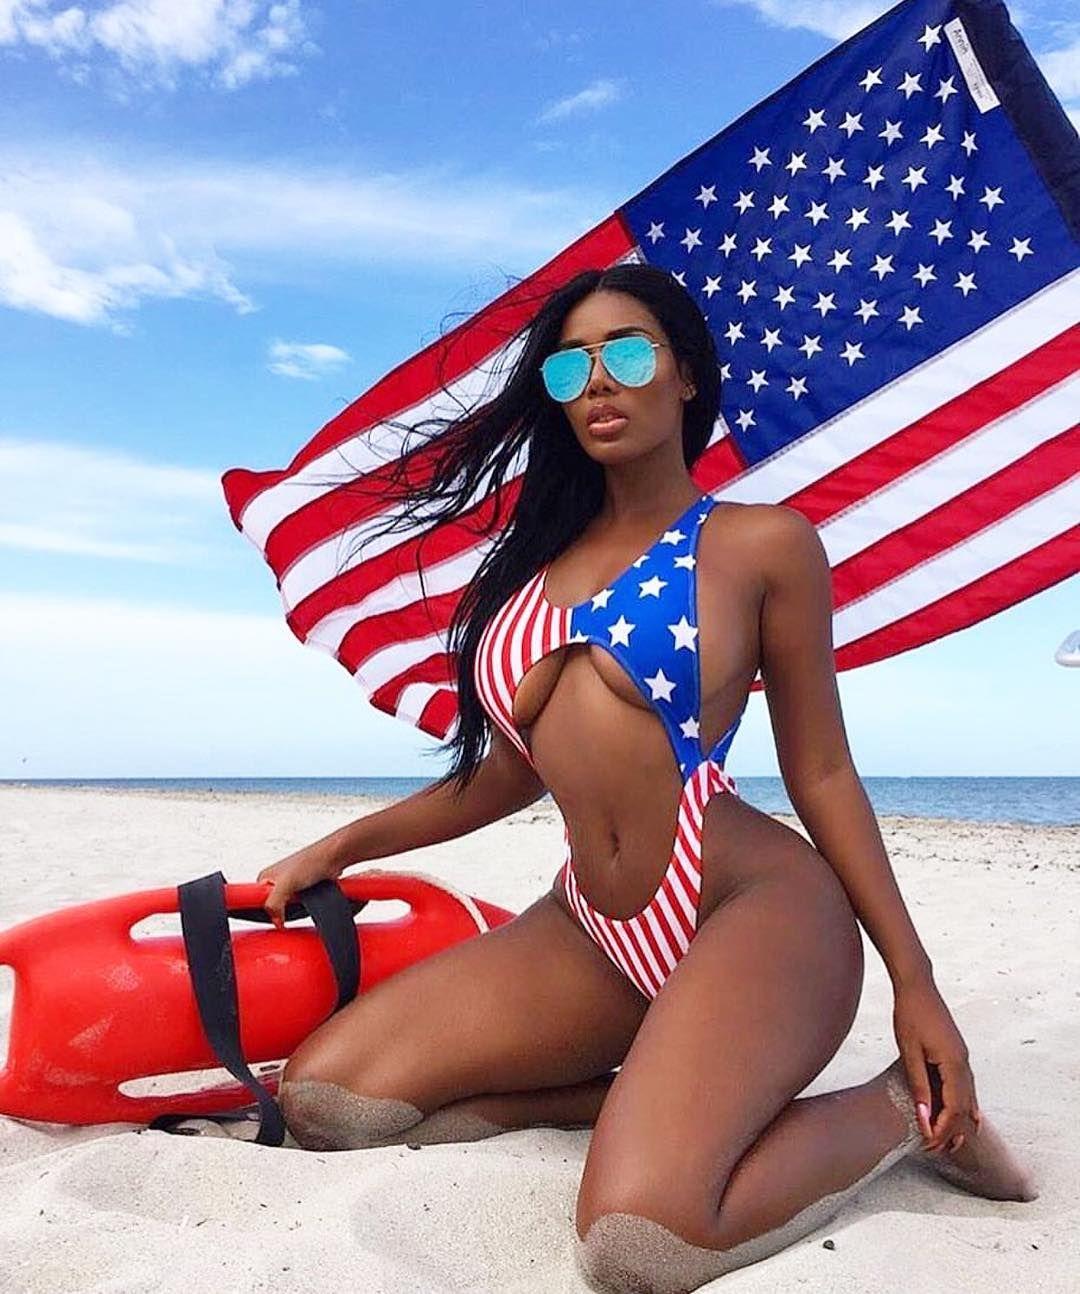 09a78a02713 OMG Swimwear #OMG #omgswimwear #omgmiamiswimwear #miami #swimsuits #bikini # swimwear